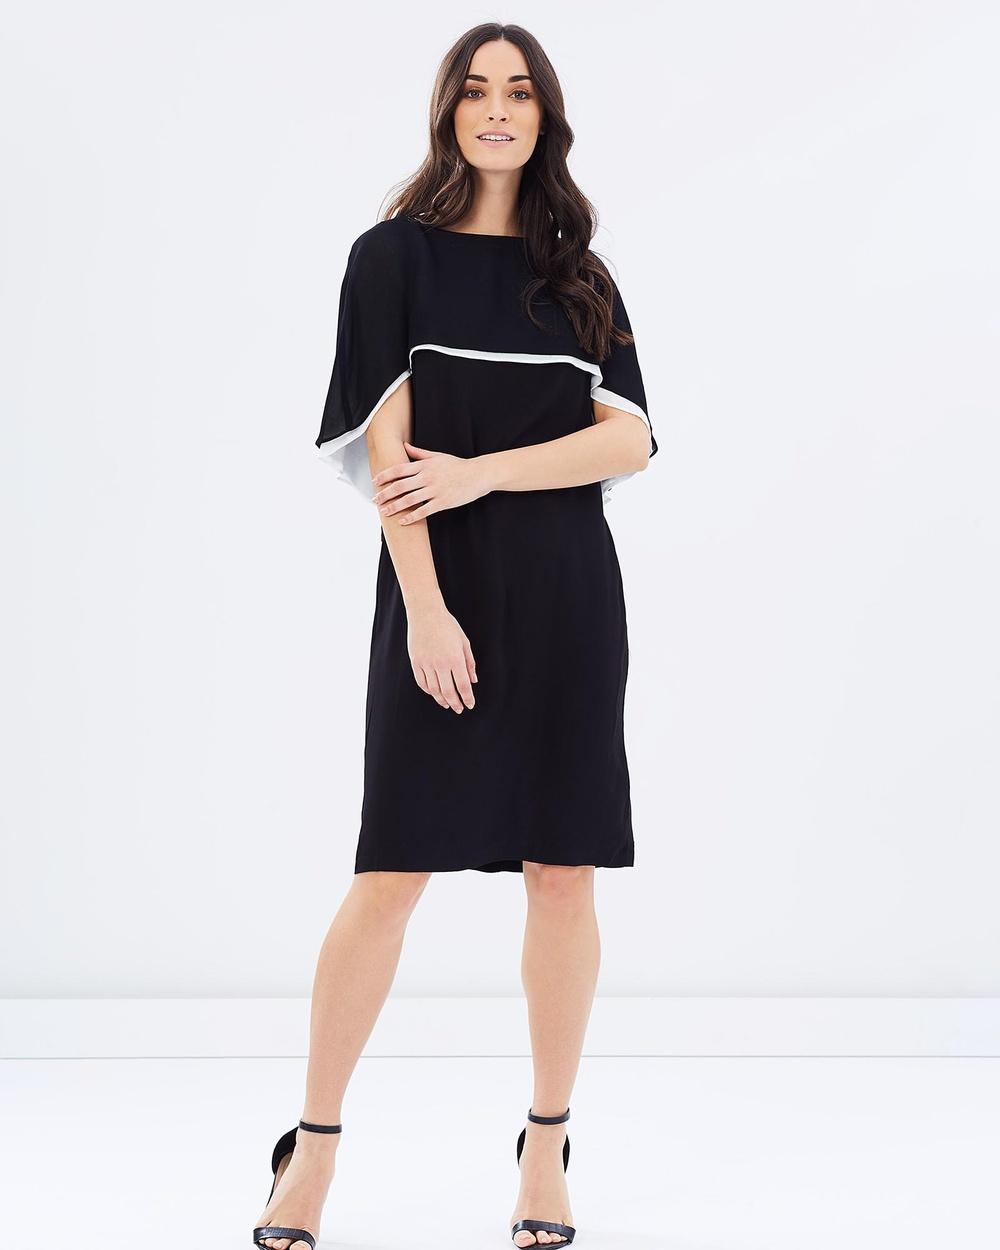 Faye Black Label Signature Cape Dress Dresses Black & White Signature Cape Dress